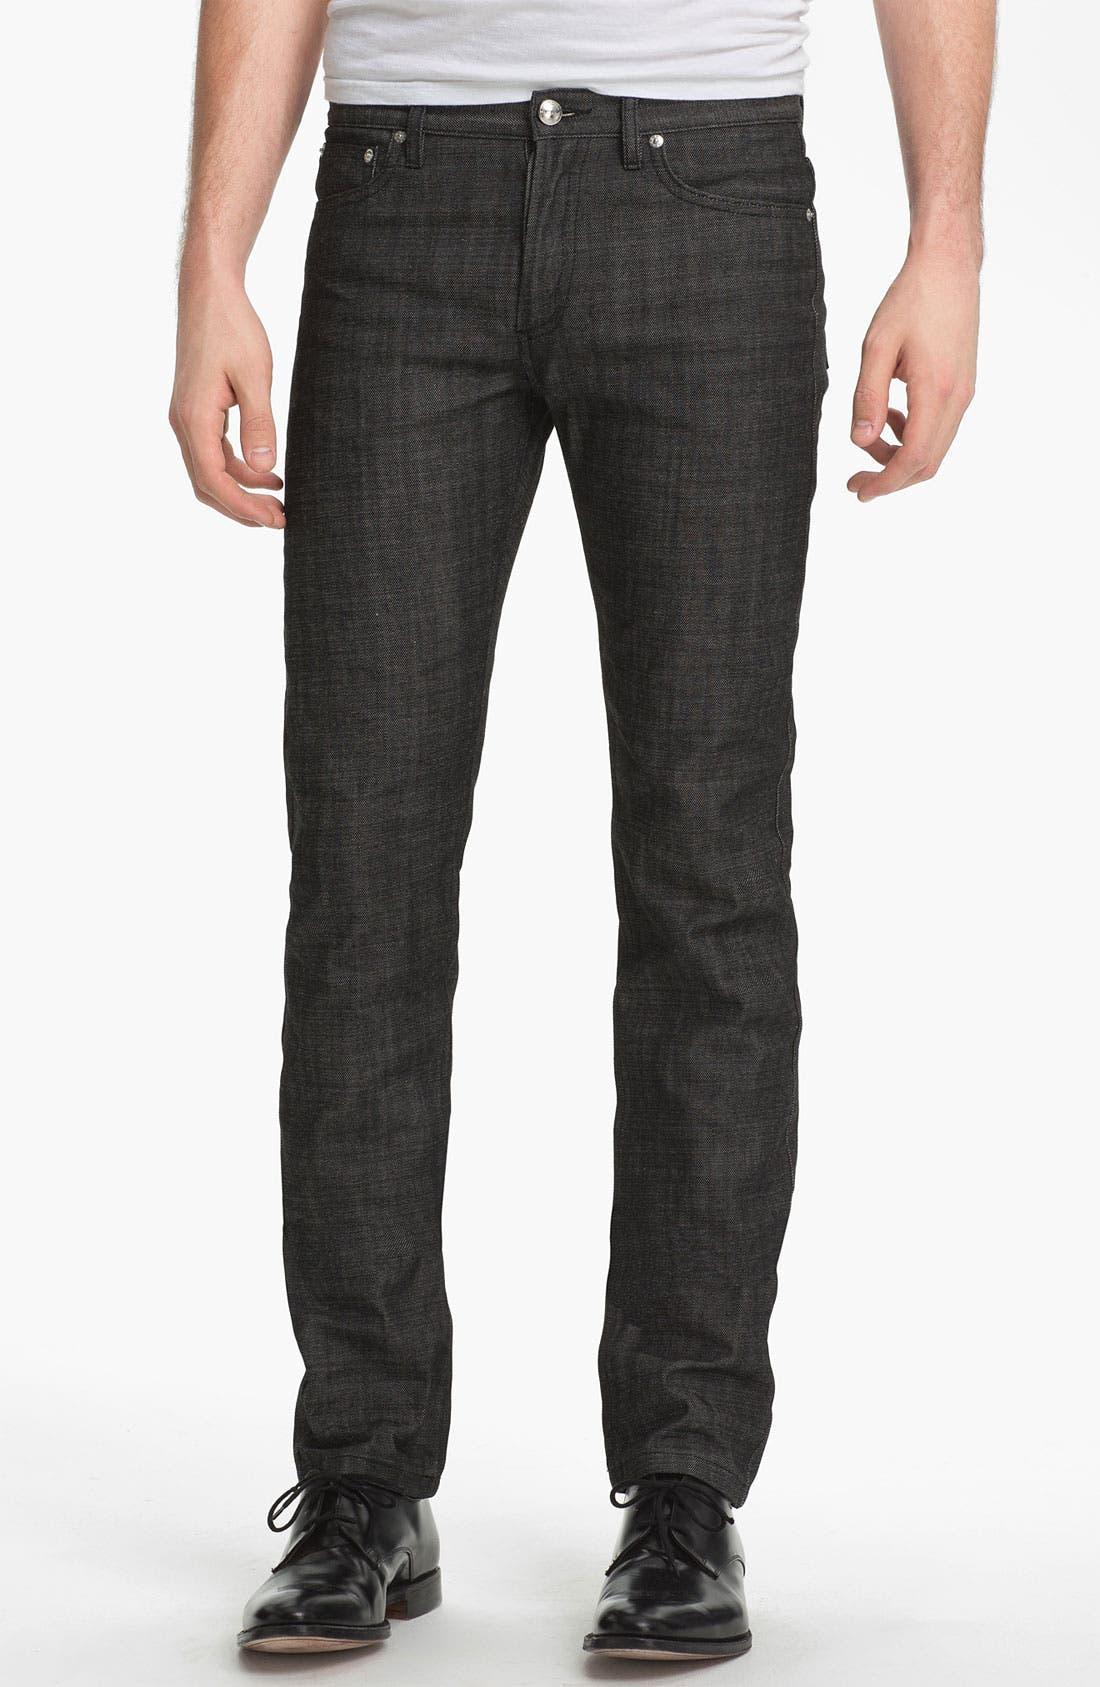 Alternate Image 1 Selected - A.P.C. 'Petit Standard' Slim Leg Jeans (Black) (Online Only)